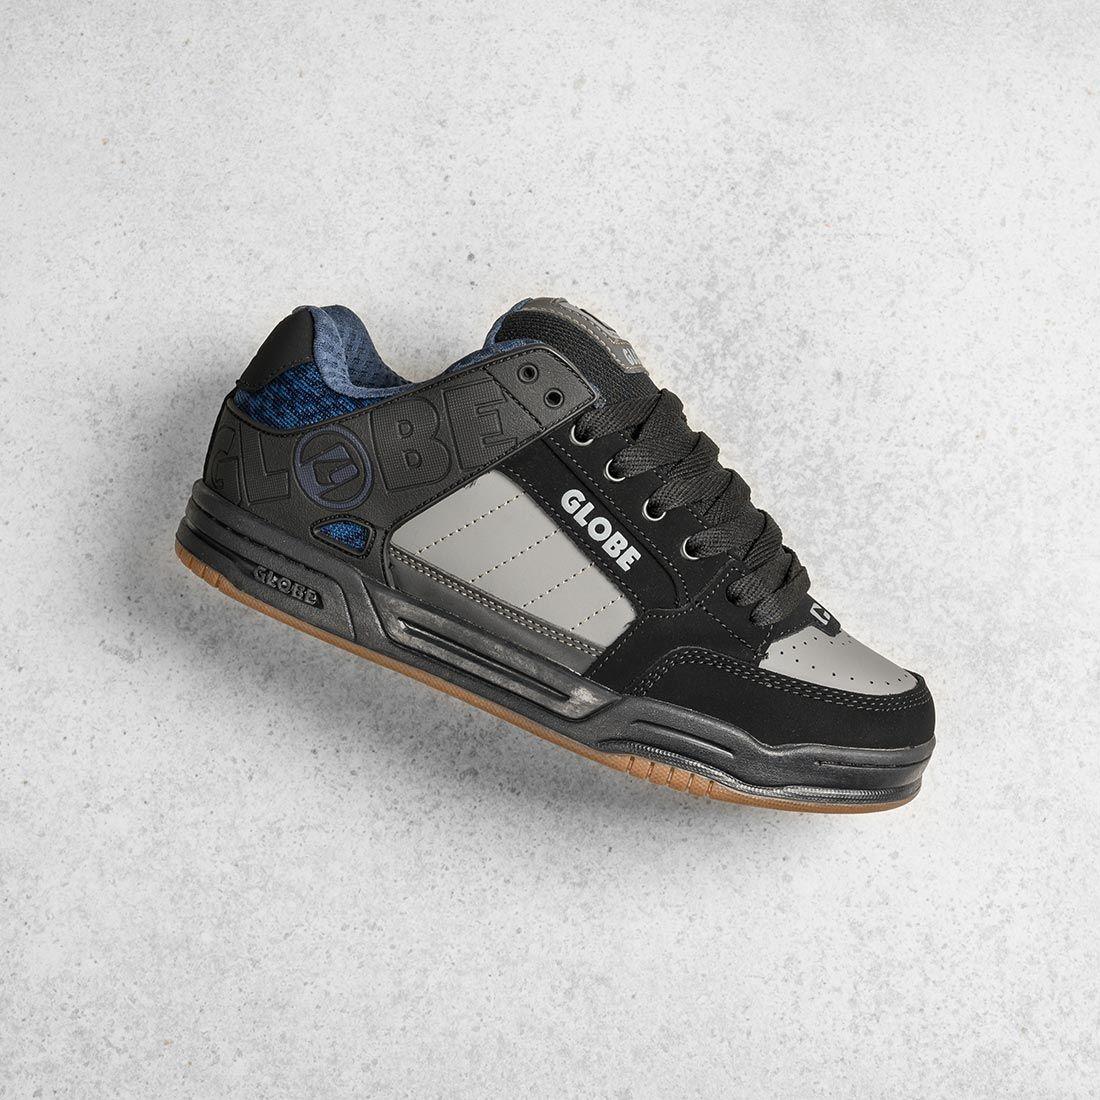 Globe Tilt Shoes - Black / Blue Knit